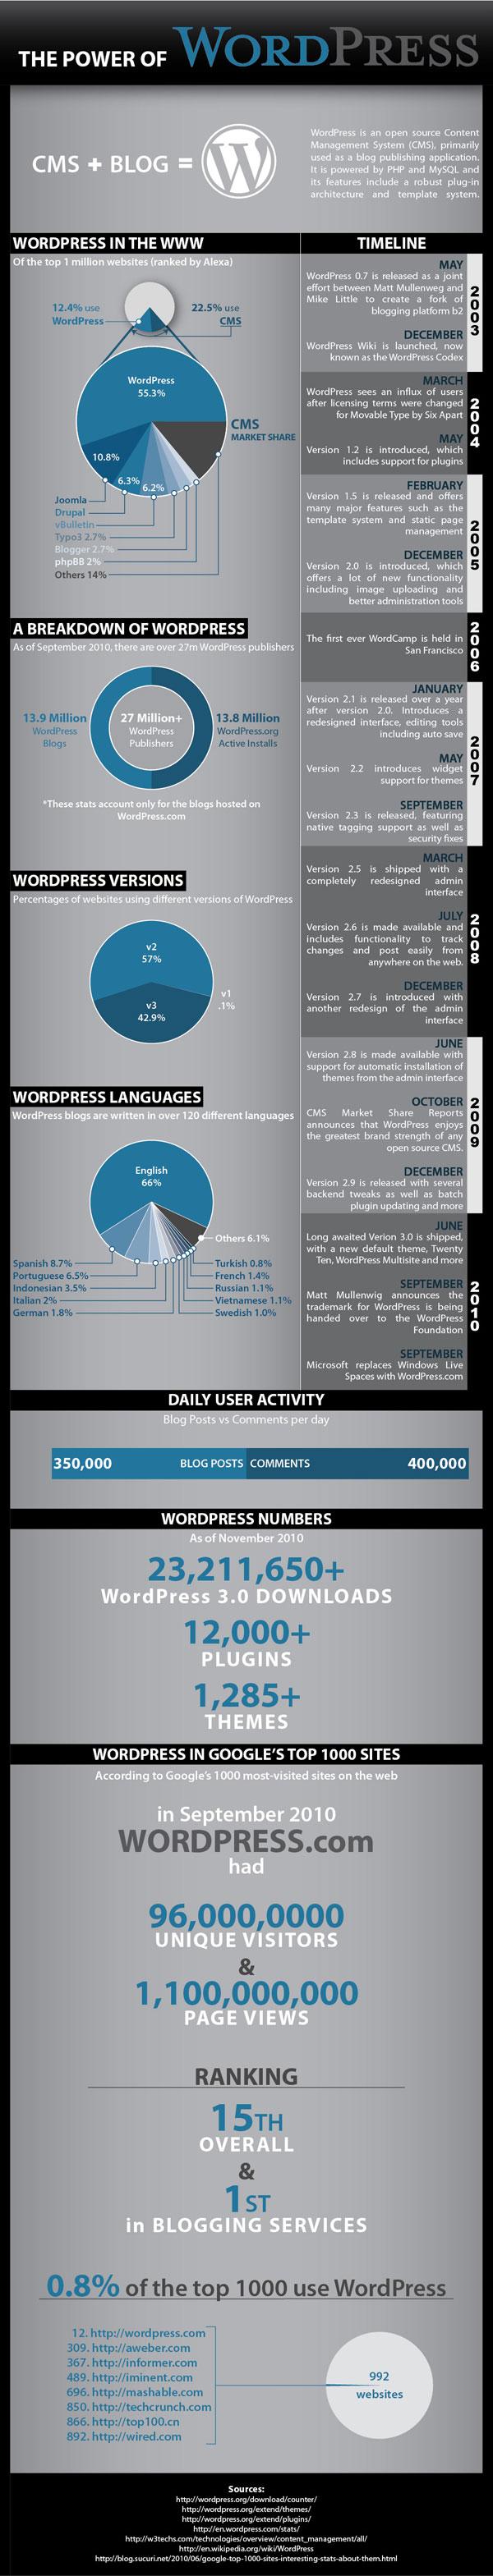 puissance de WordPress